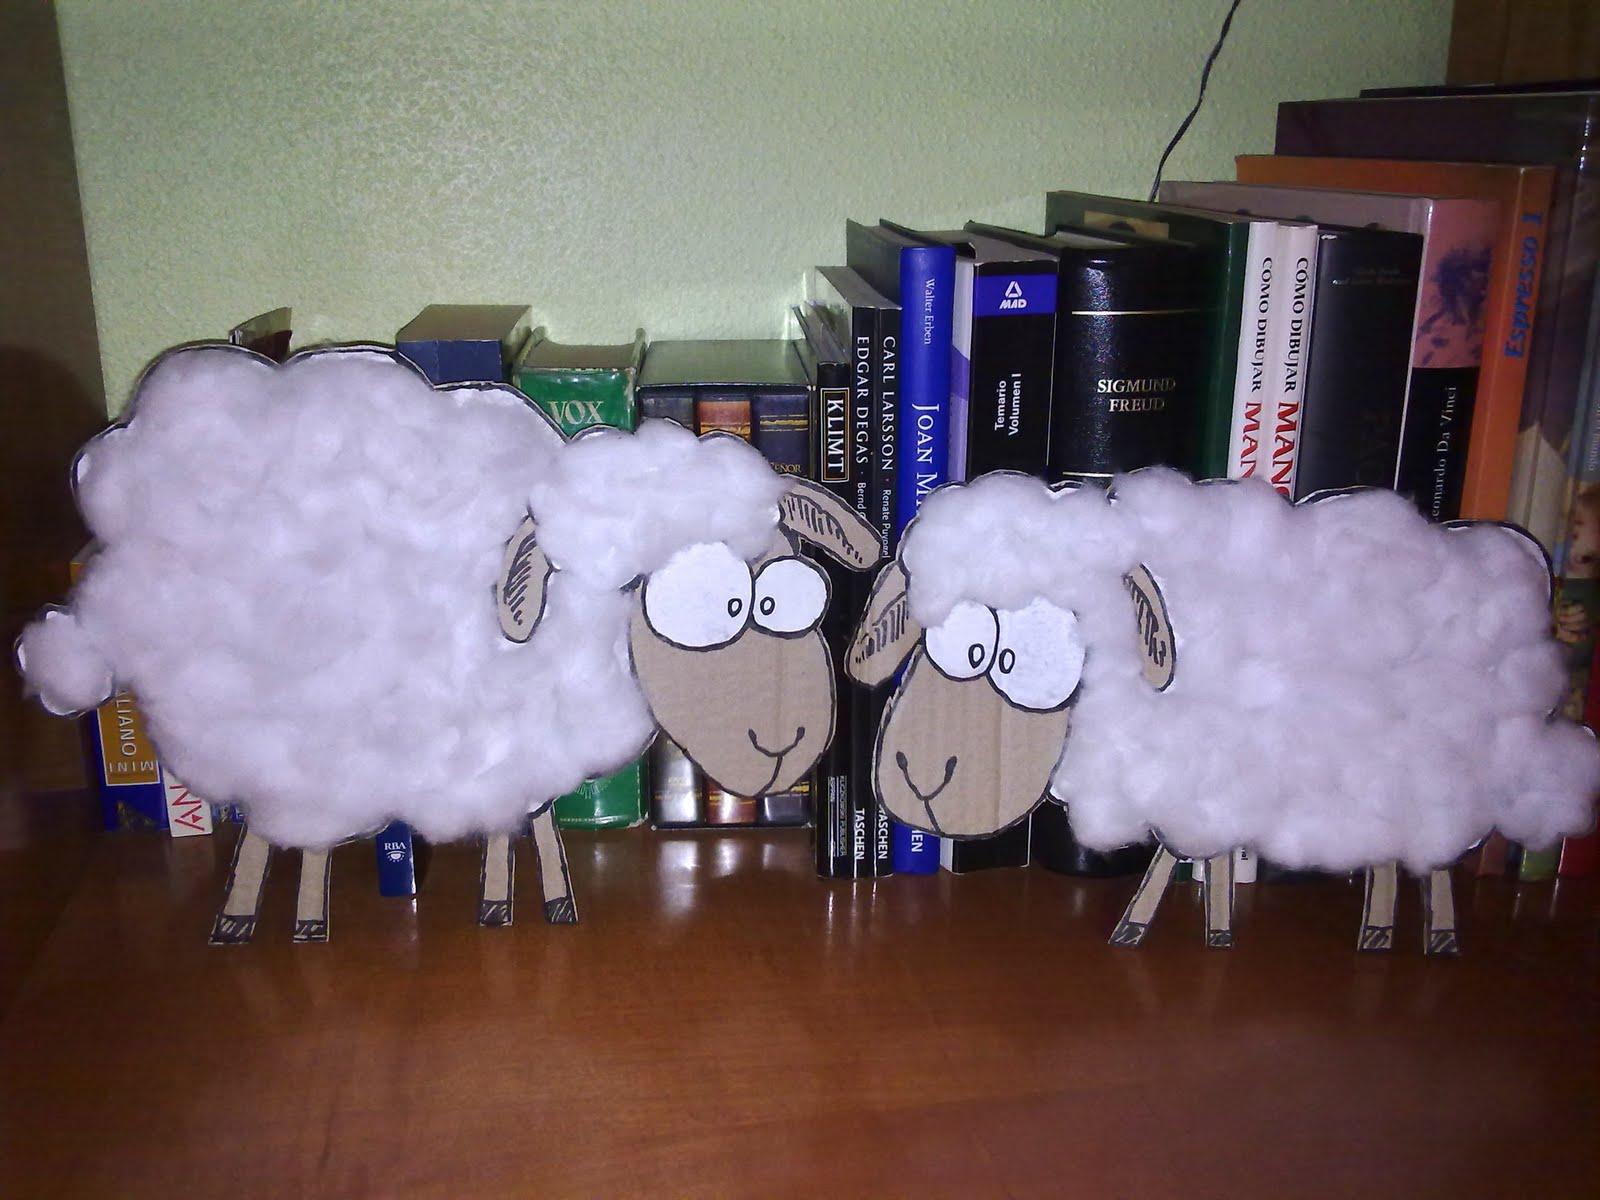 Como hacer una oveja imagui - Como hacer una oveja ...